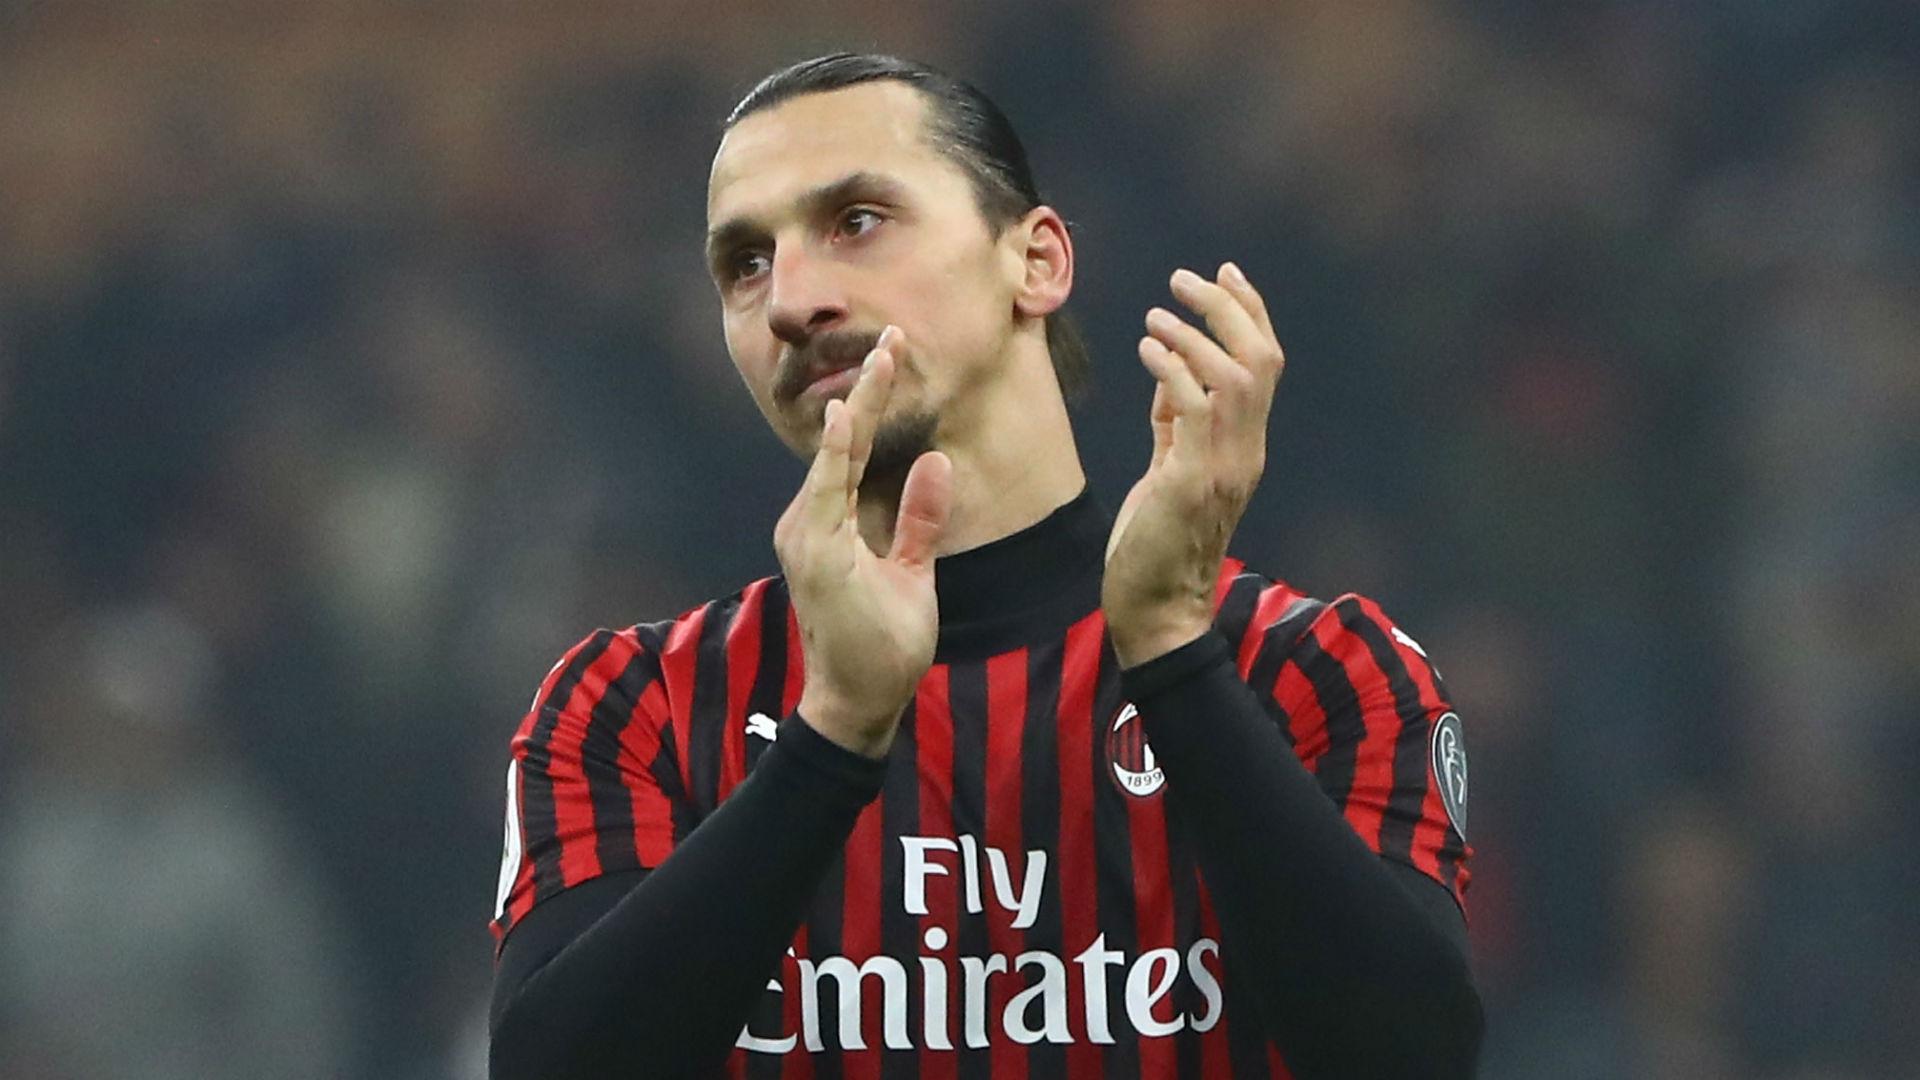 Daniel Maldini Becomes The Third Generation Maldini To Play For AC Milan